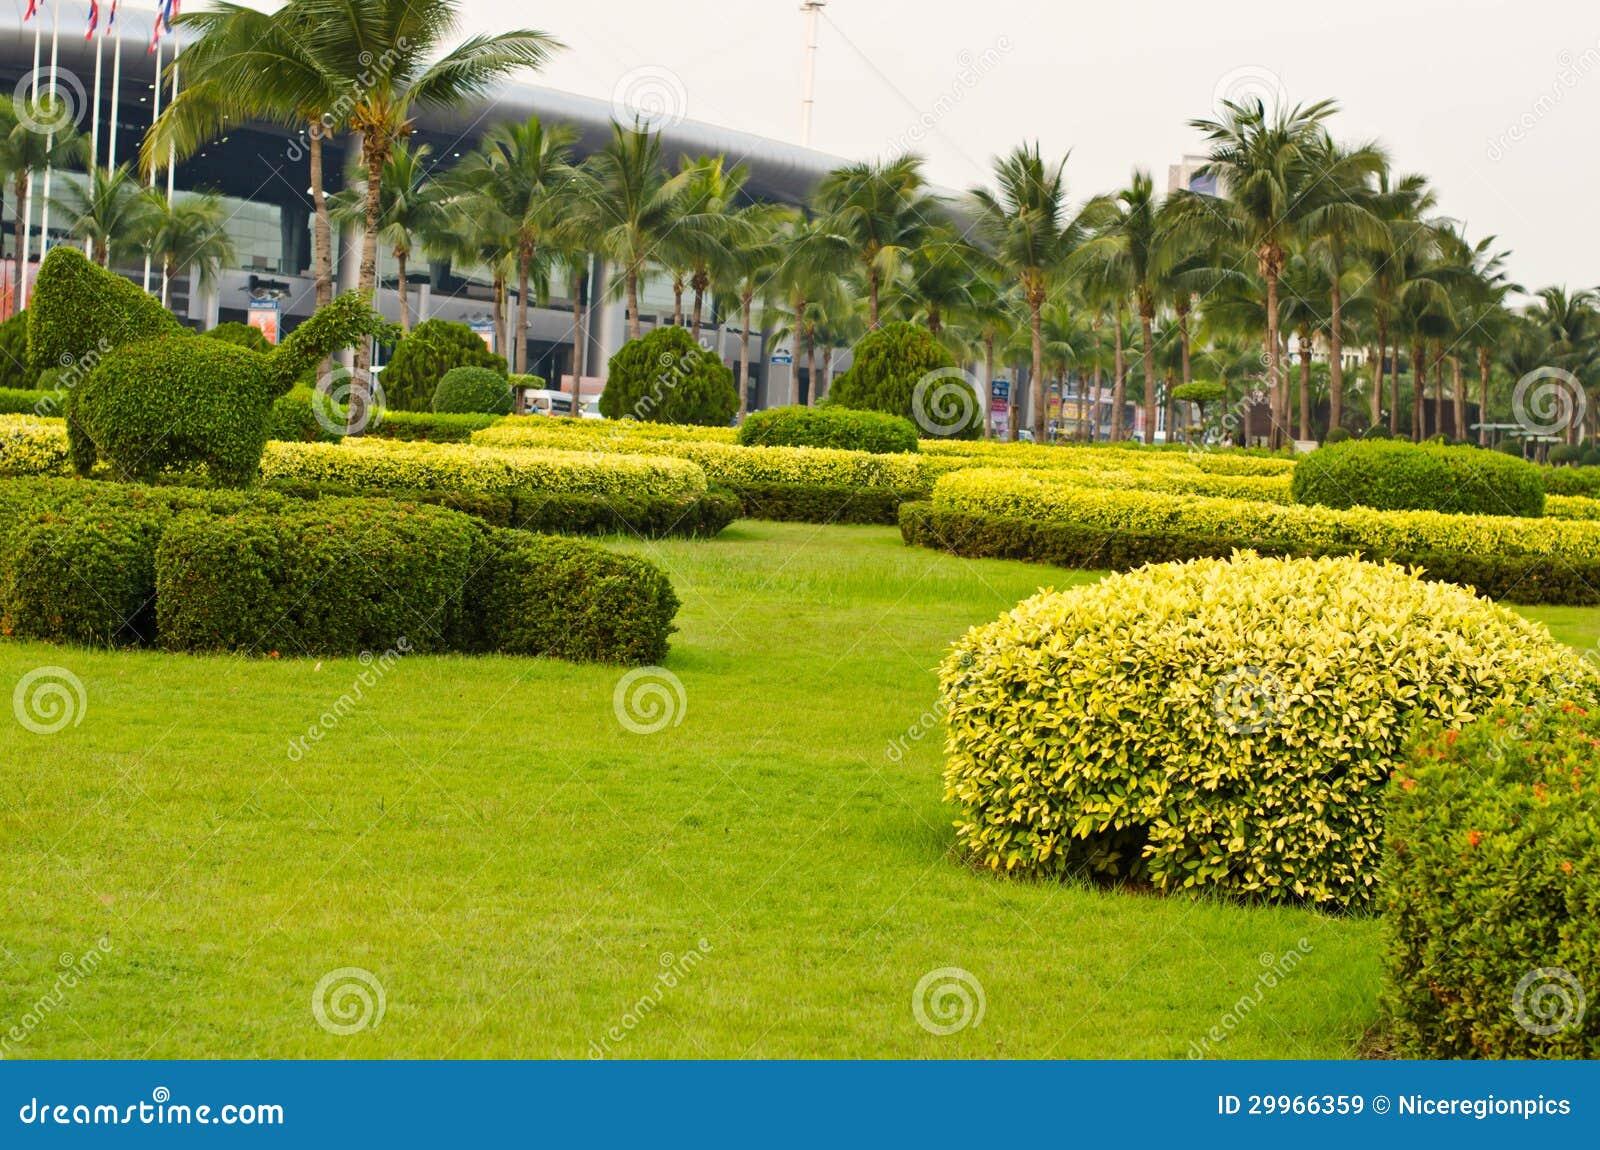 imagens jardins lindos:Imagens de Stock Royalty Free: Jardins bonitos.